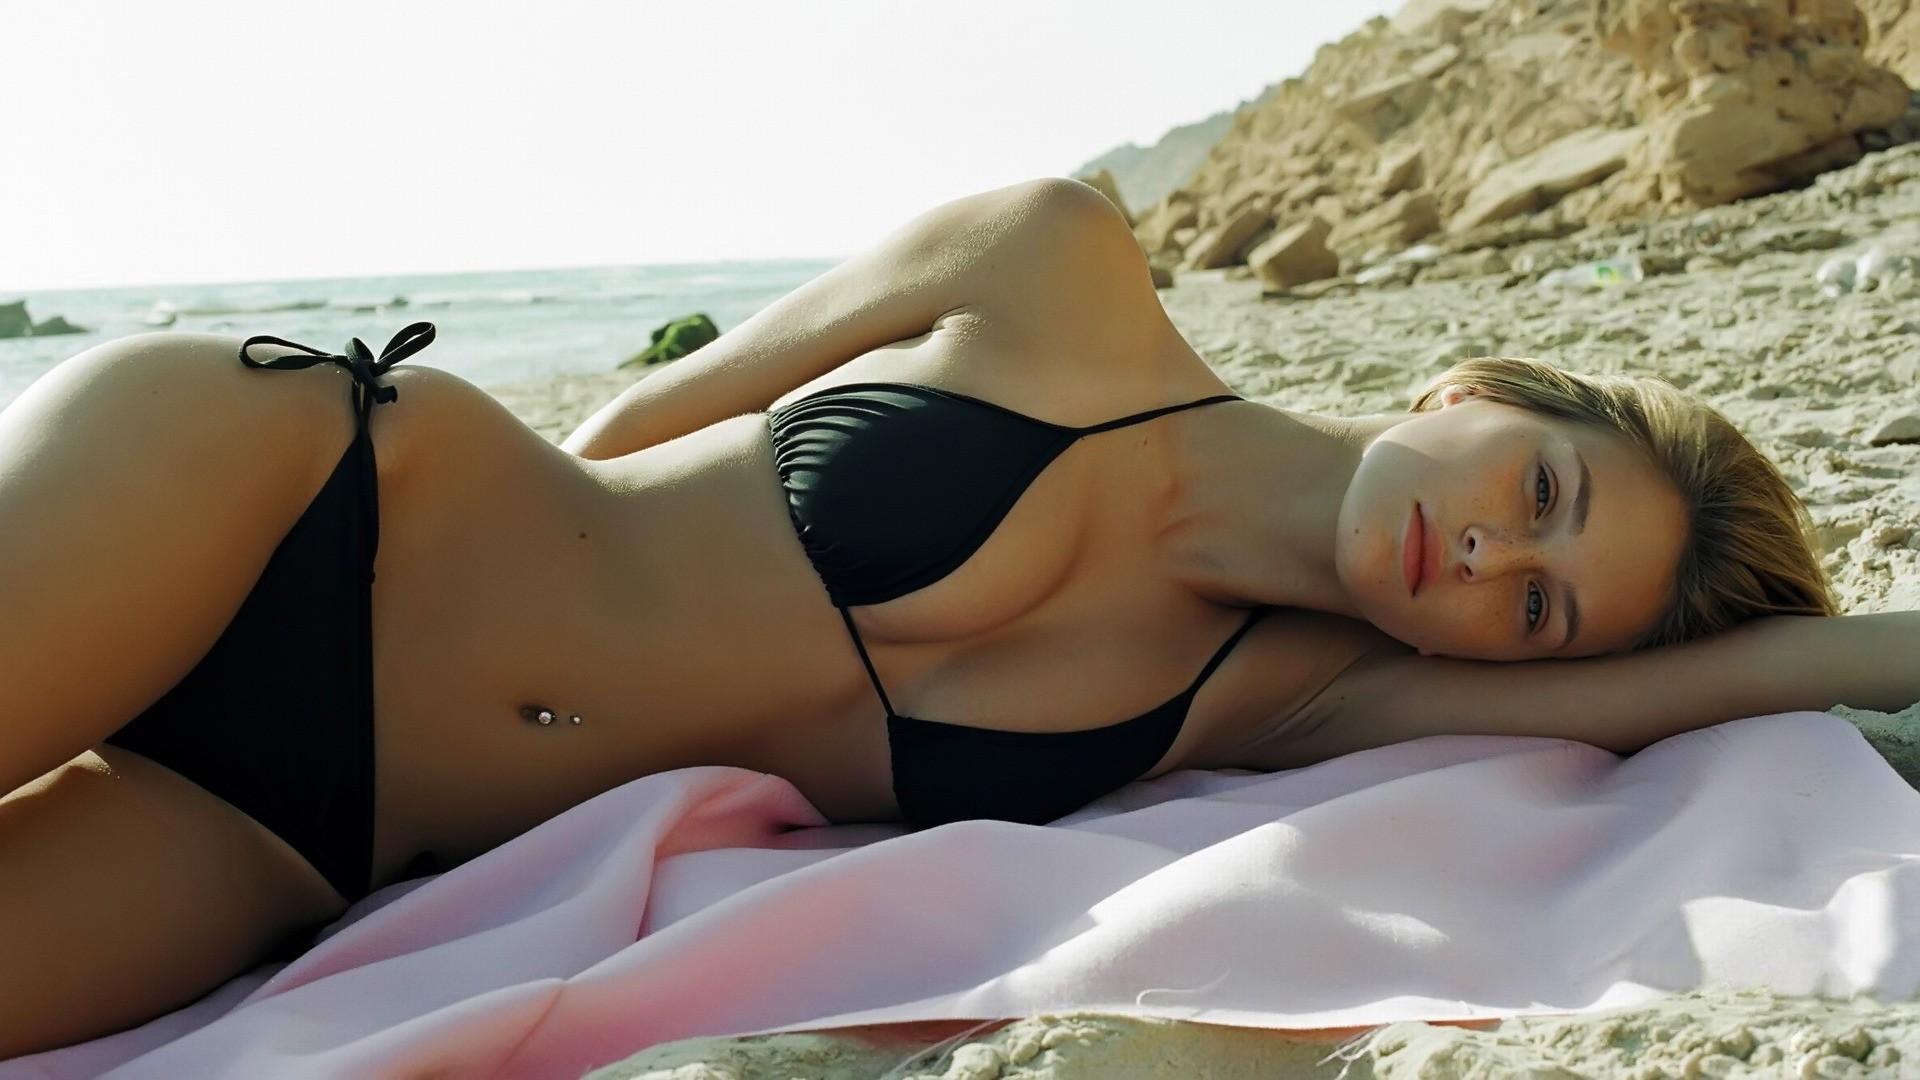 Nude-photo scandal in U. S. Marines Katehon think tank.